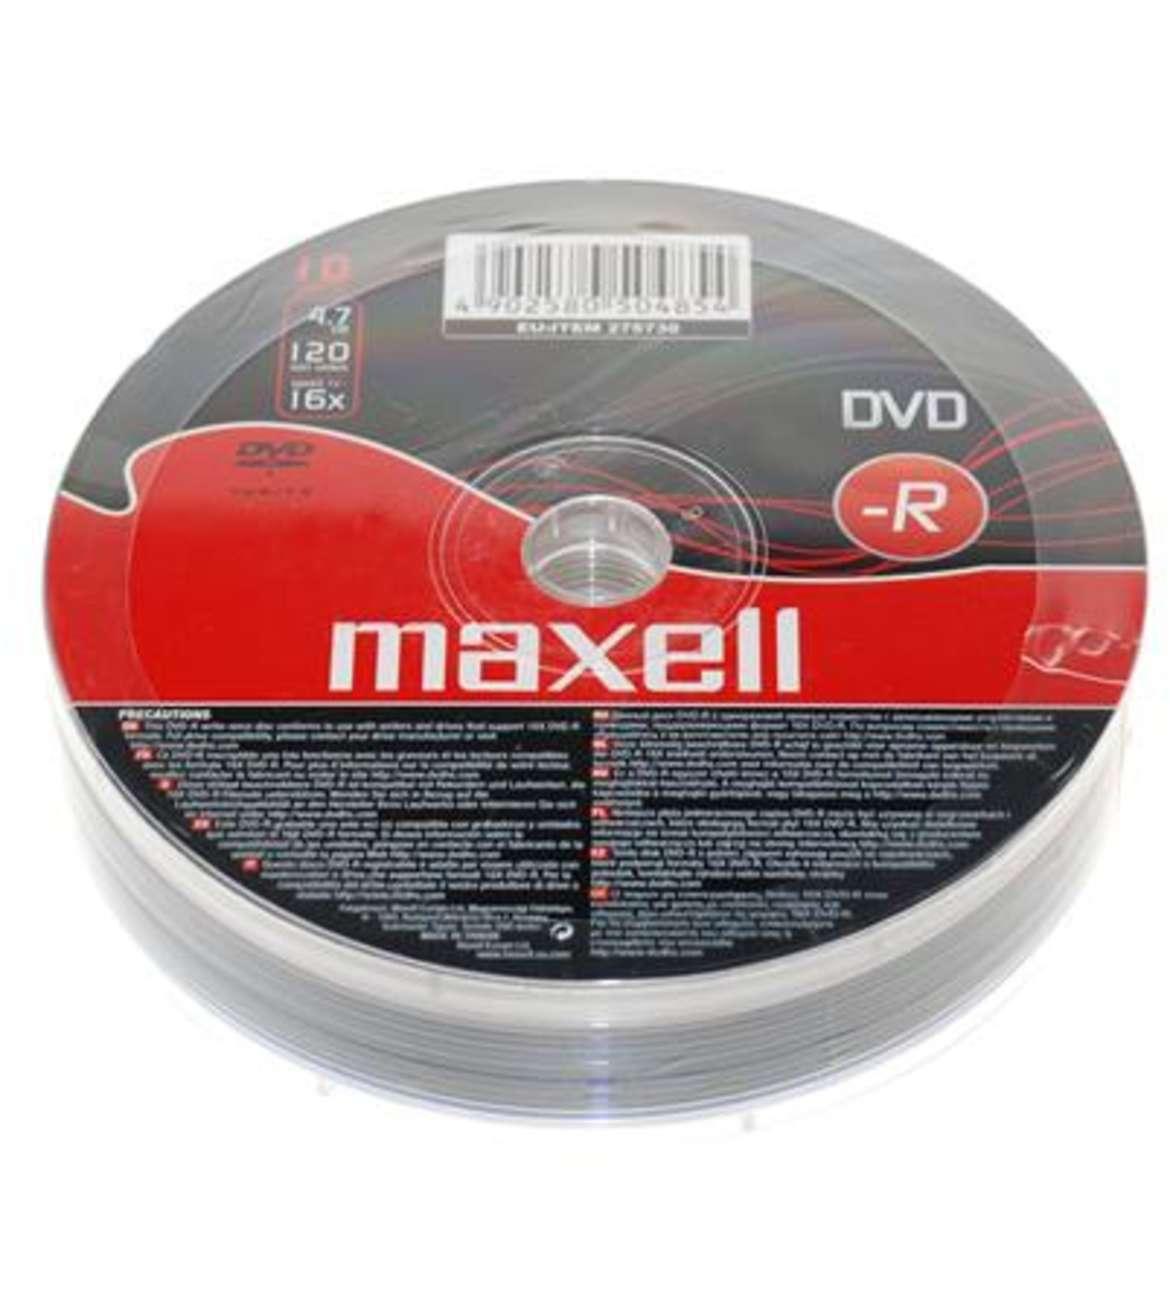 MAXELL DVD-R 4.7GB 16X ECONOMIC 10S